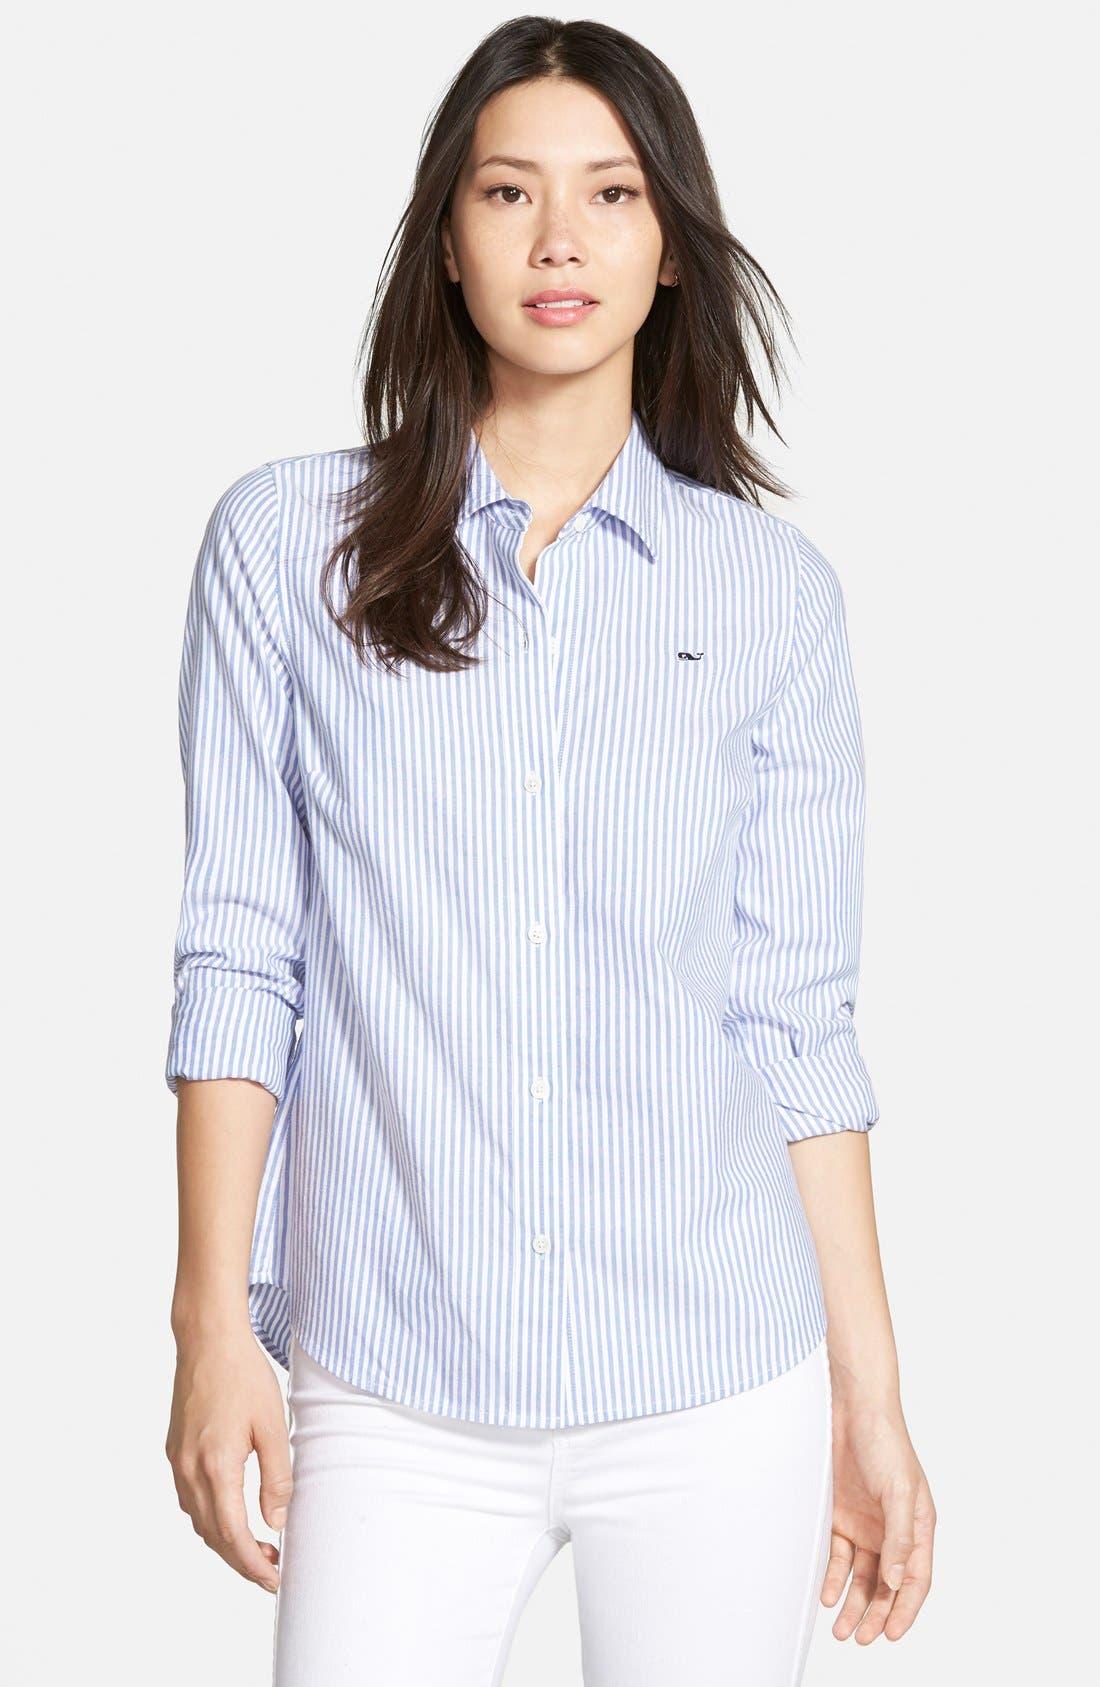 Main Image - Vineyard Vines Oxford Stripe Shirt